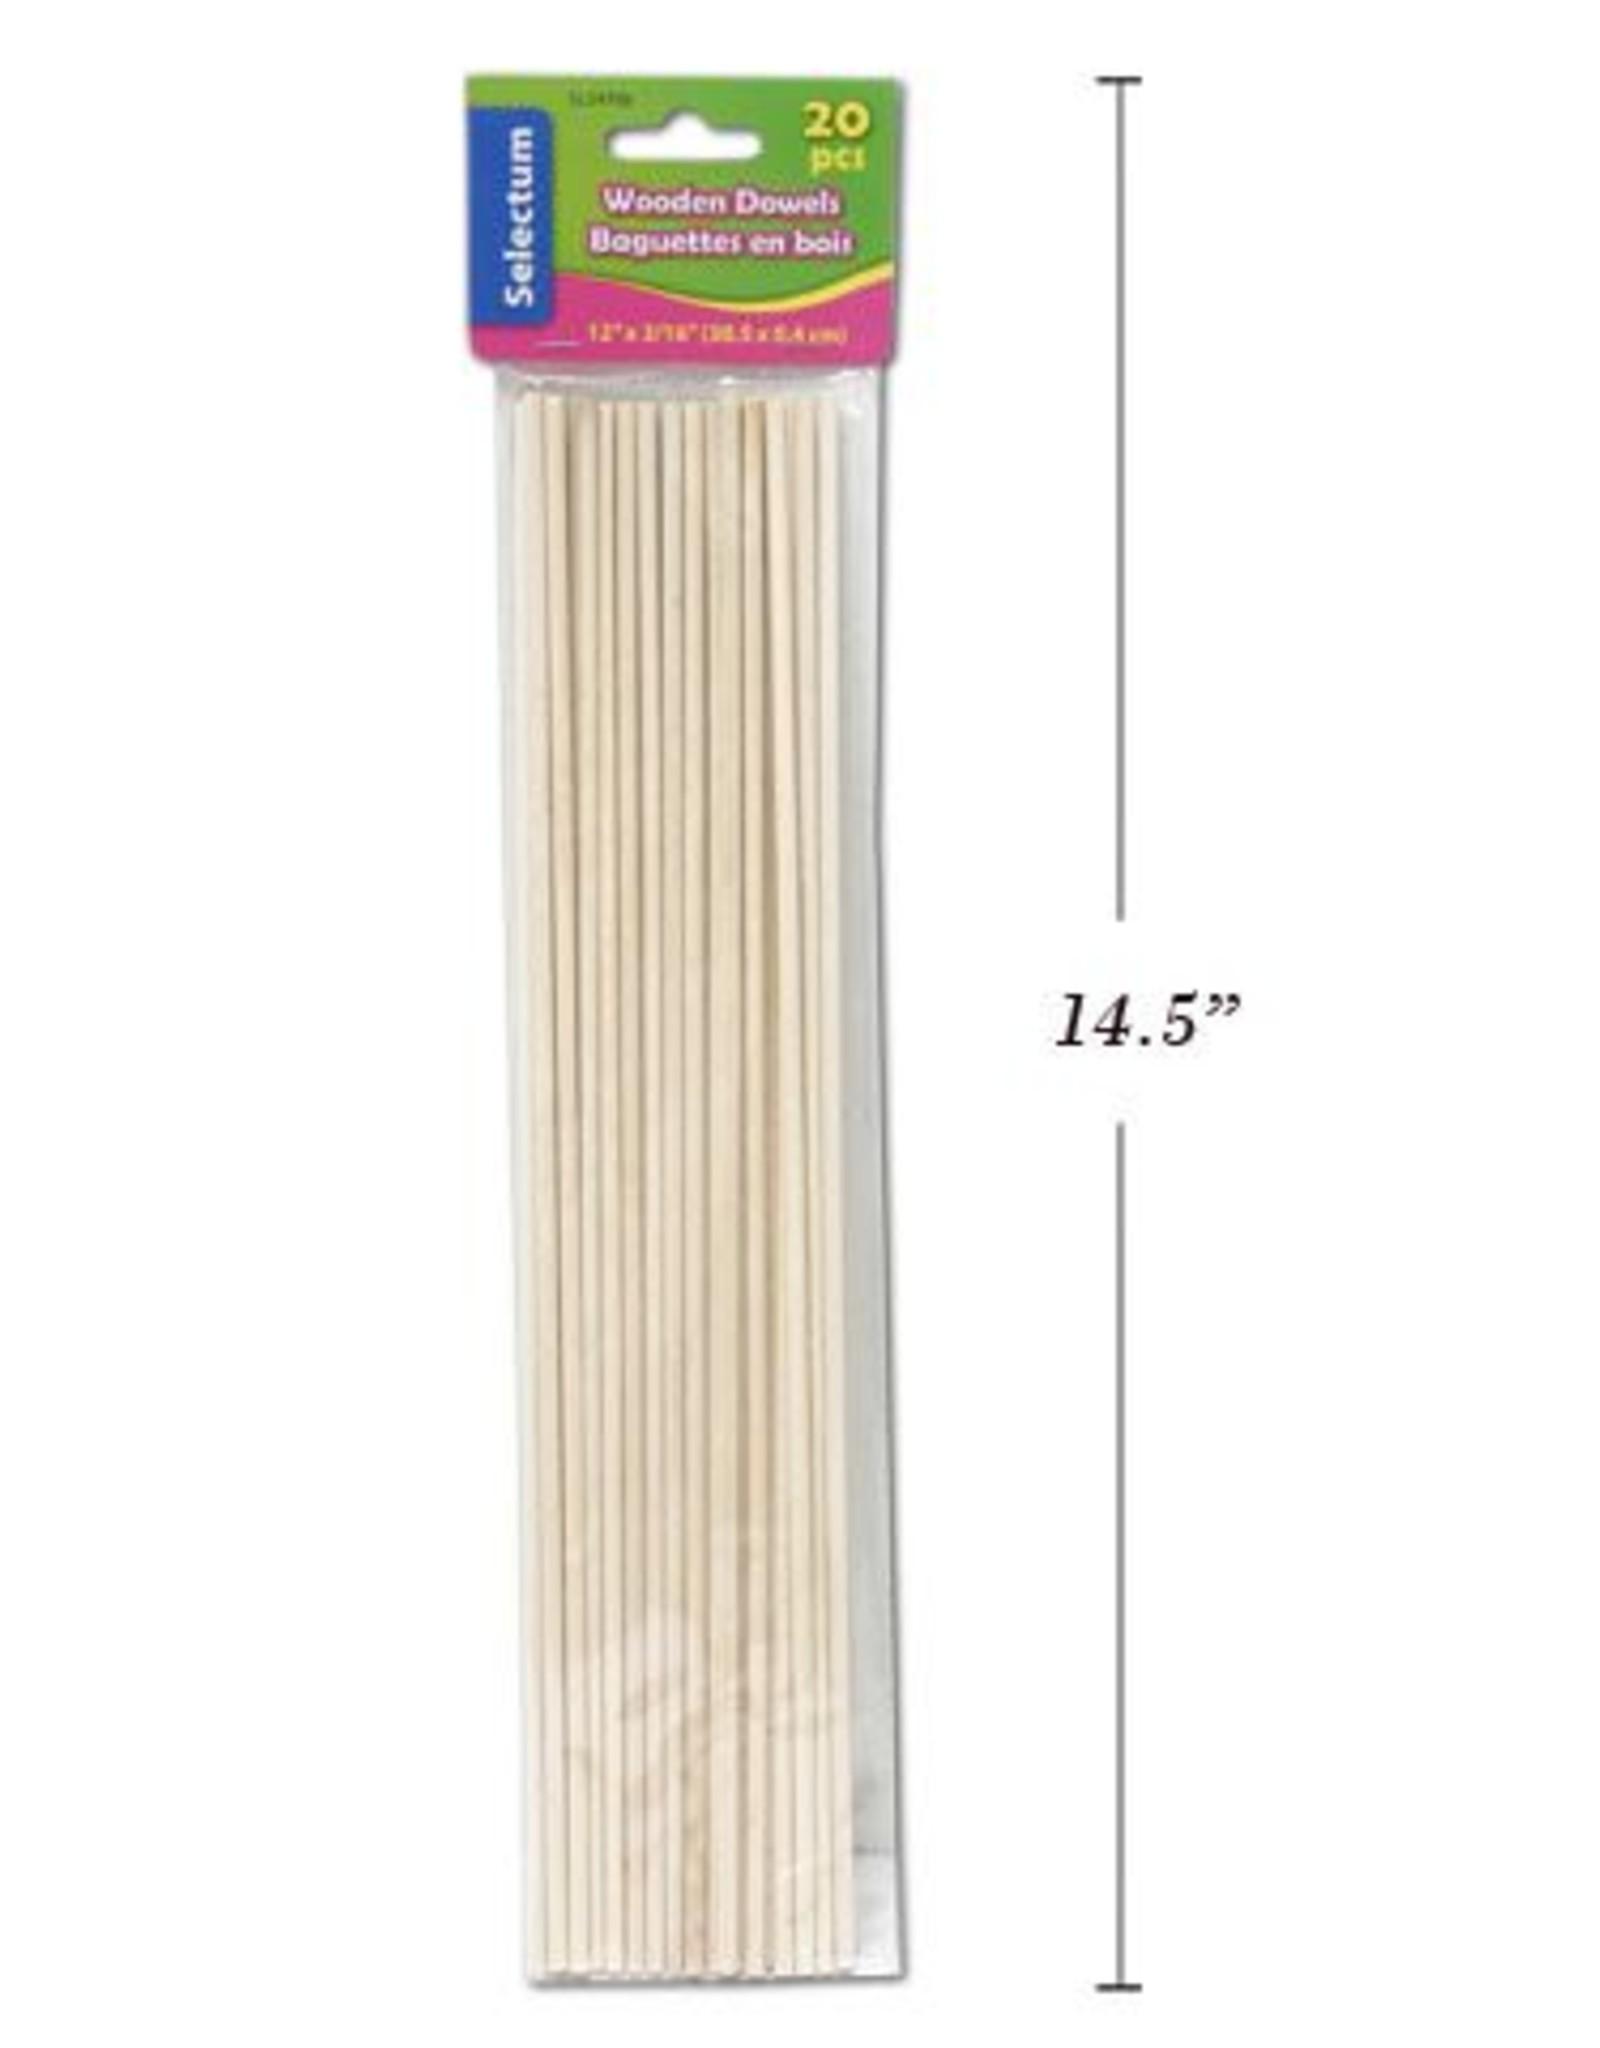 "20 Pc Wooden Dowels 12""X 3/16"" (30.5Cmx0.4Cm)"